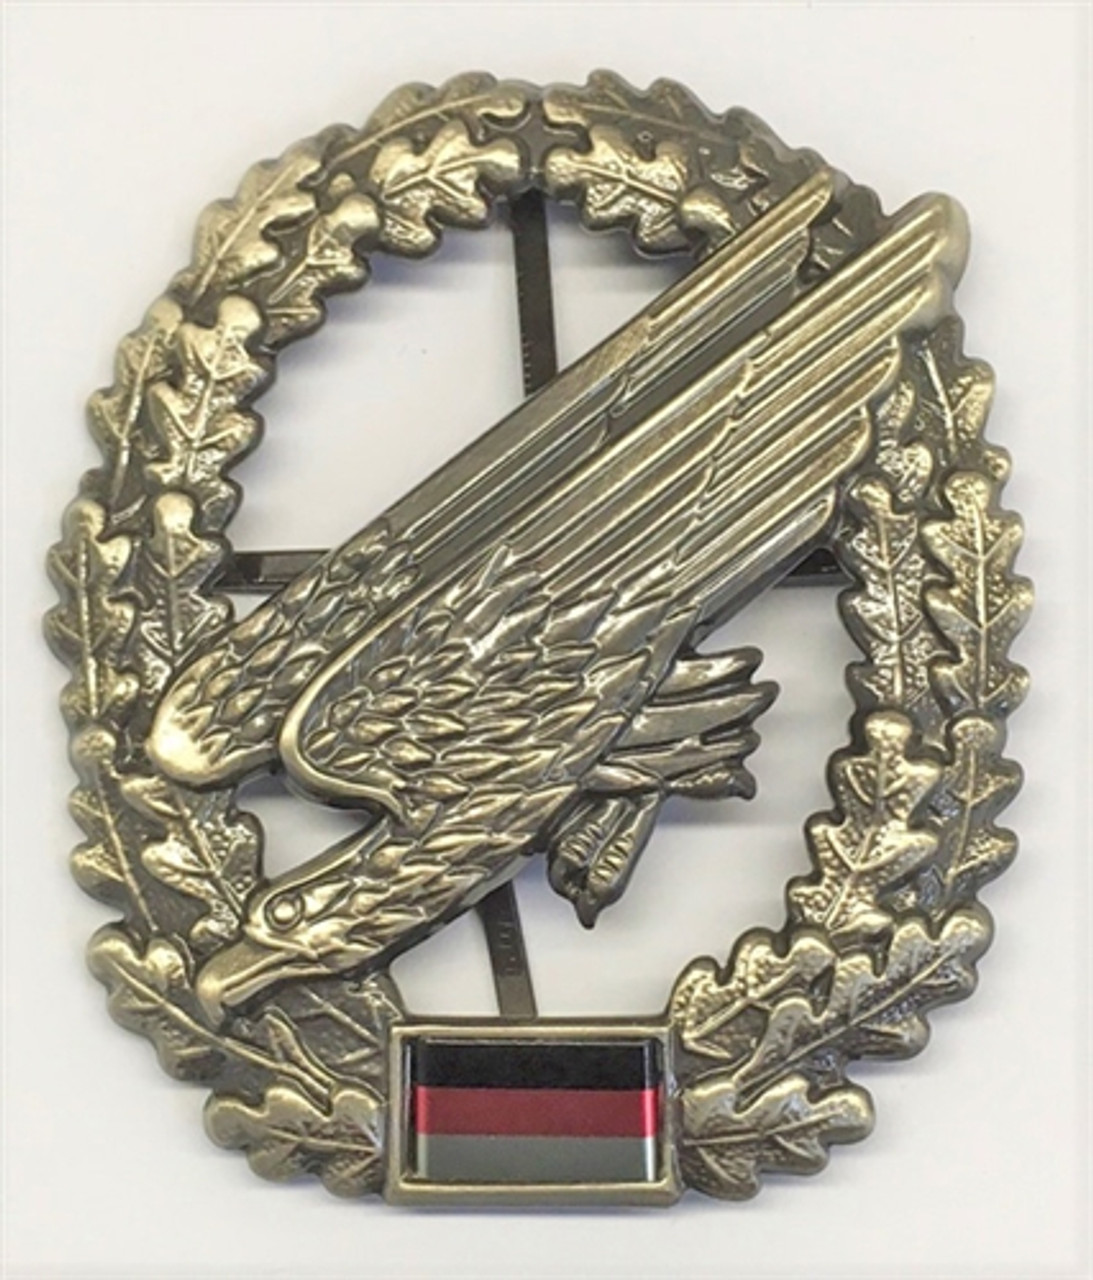 Bw Fallschirmjäger Beret Badge from Hessen Antique from Hessen Antique